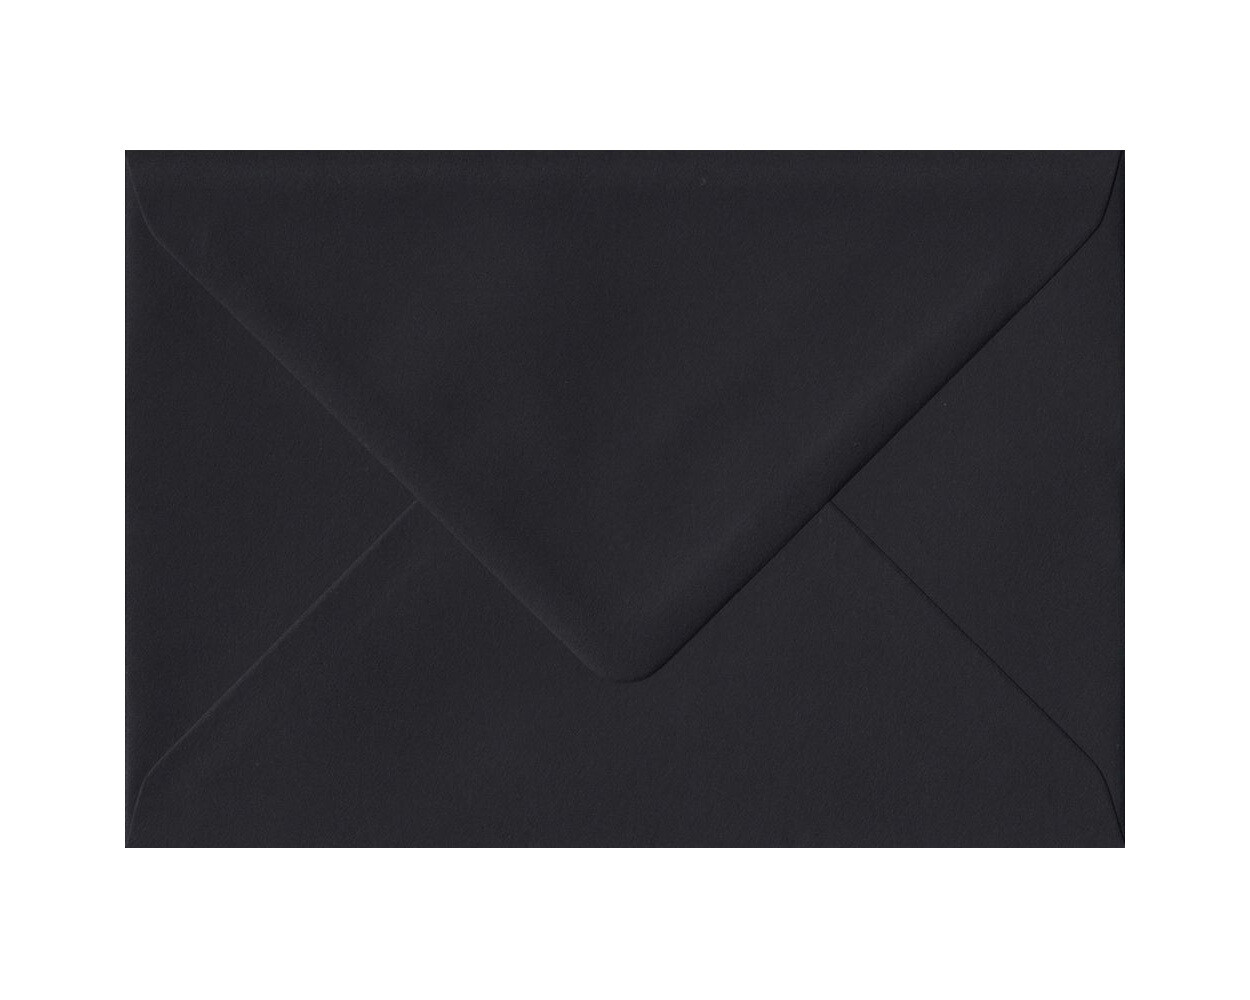 25 Sobres rectangular 13.7 x 18.7 cm 100g Burano Negro